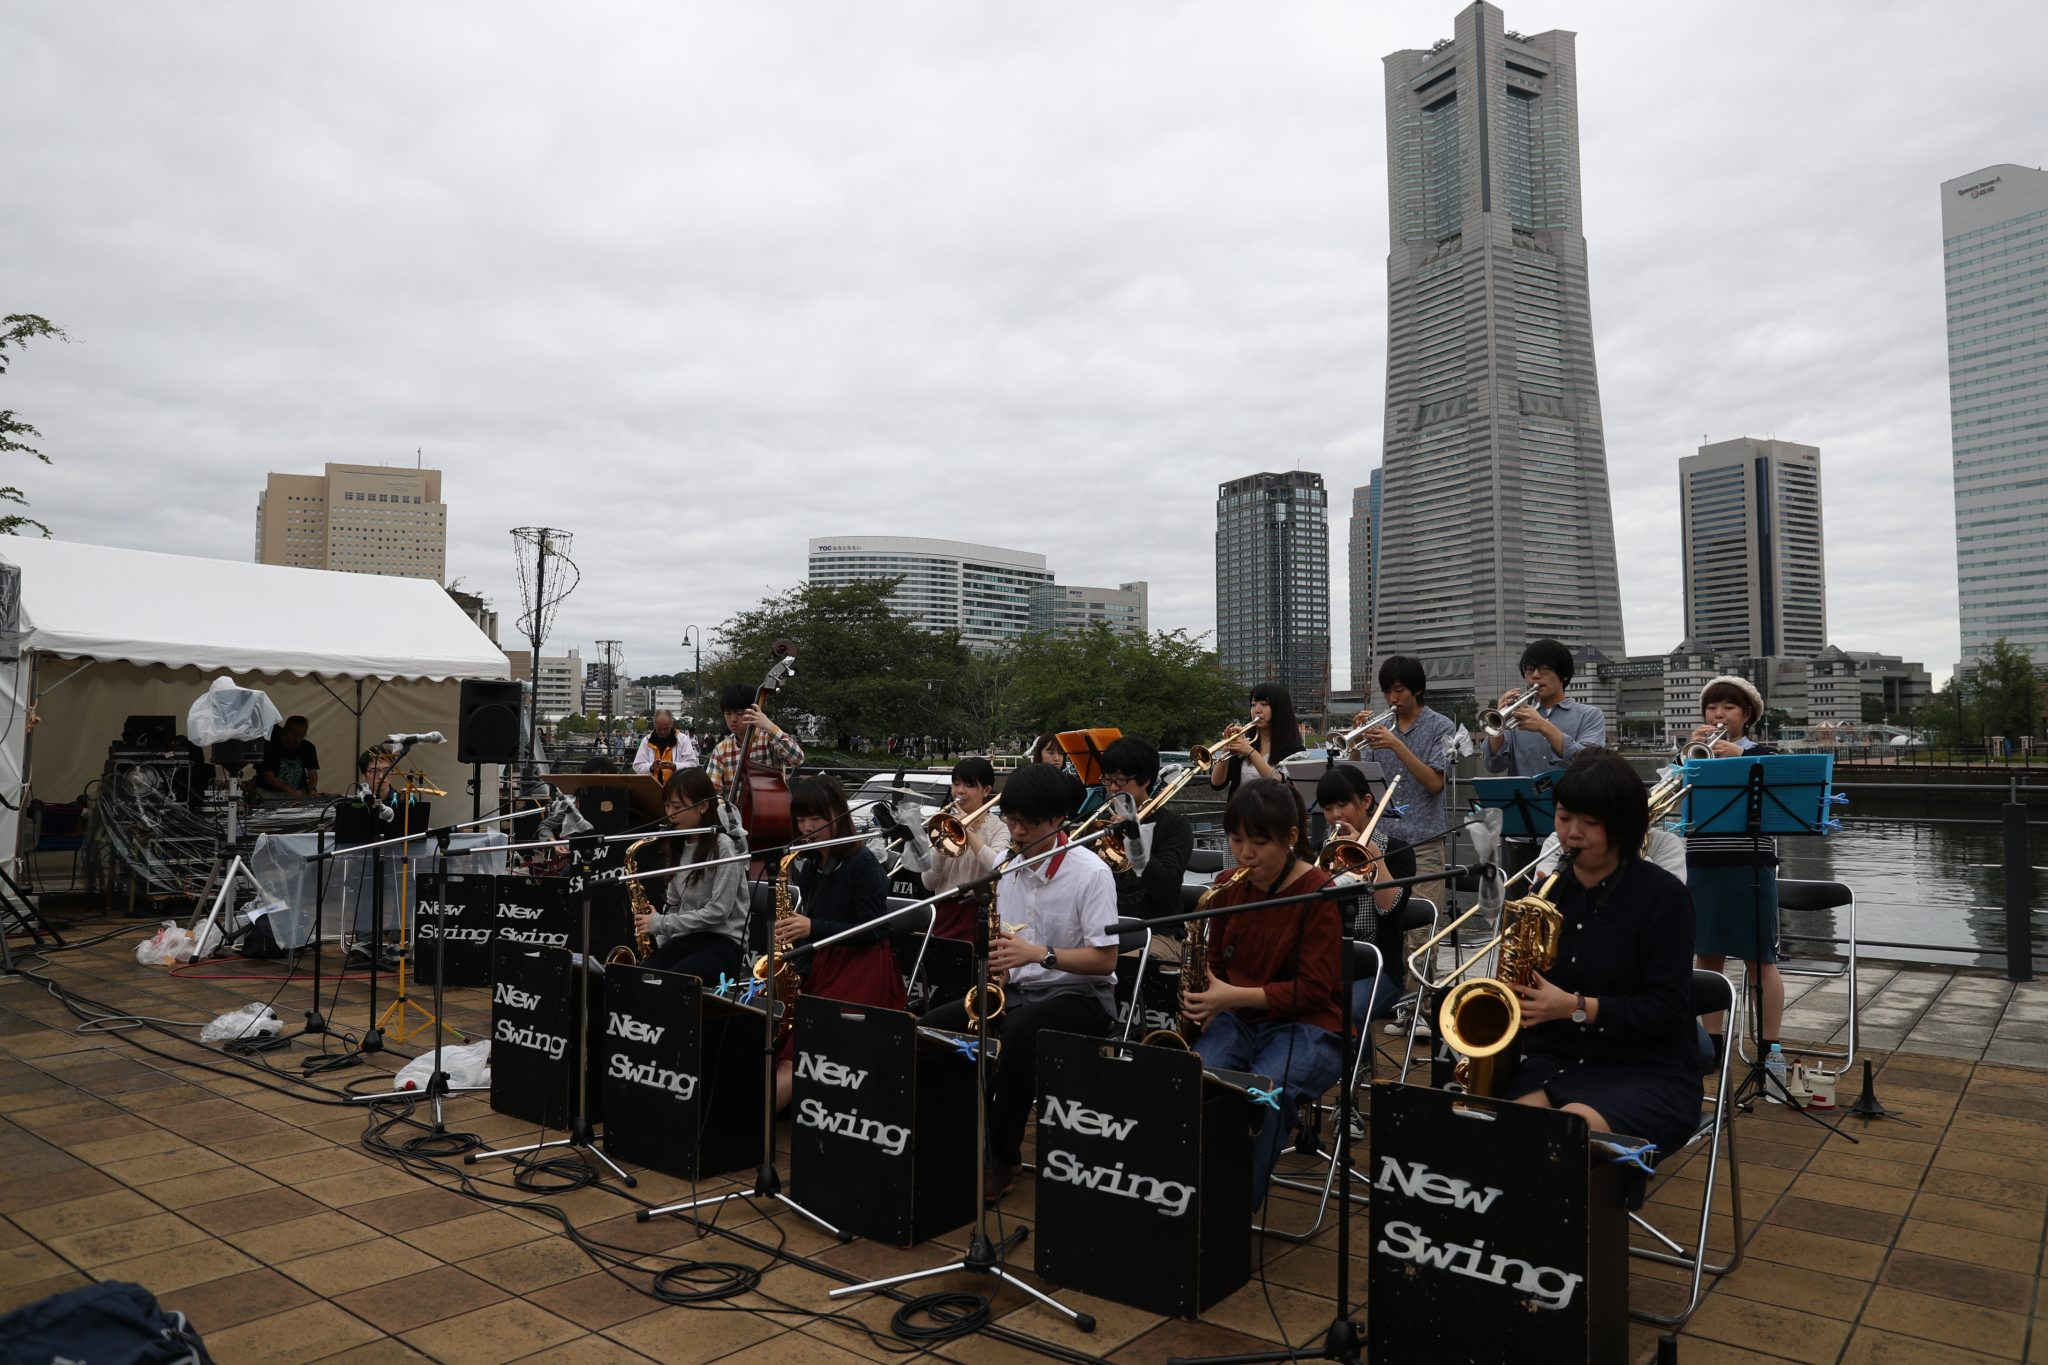 JP16 1009 運河パーク(ワールドポーターズ前) 上智大学New Swing Jazz Orchestra Regular Band  (c)YJP(撮影:大友) (35)